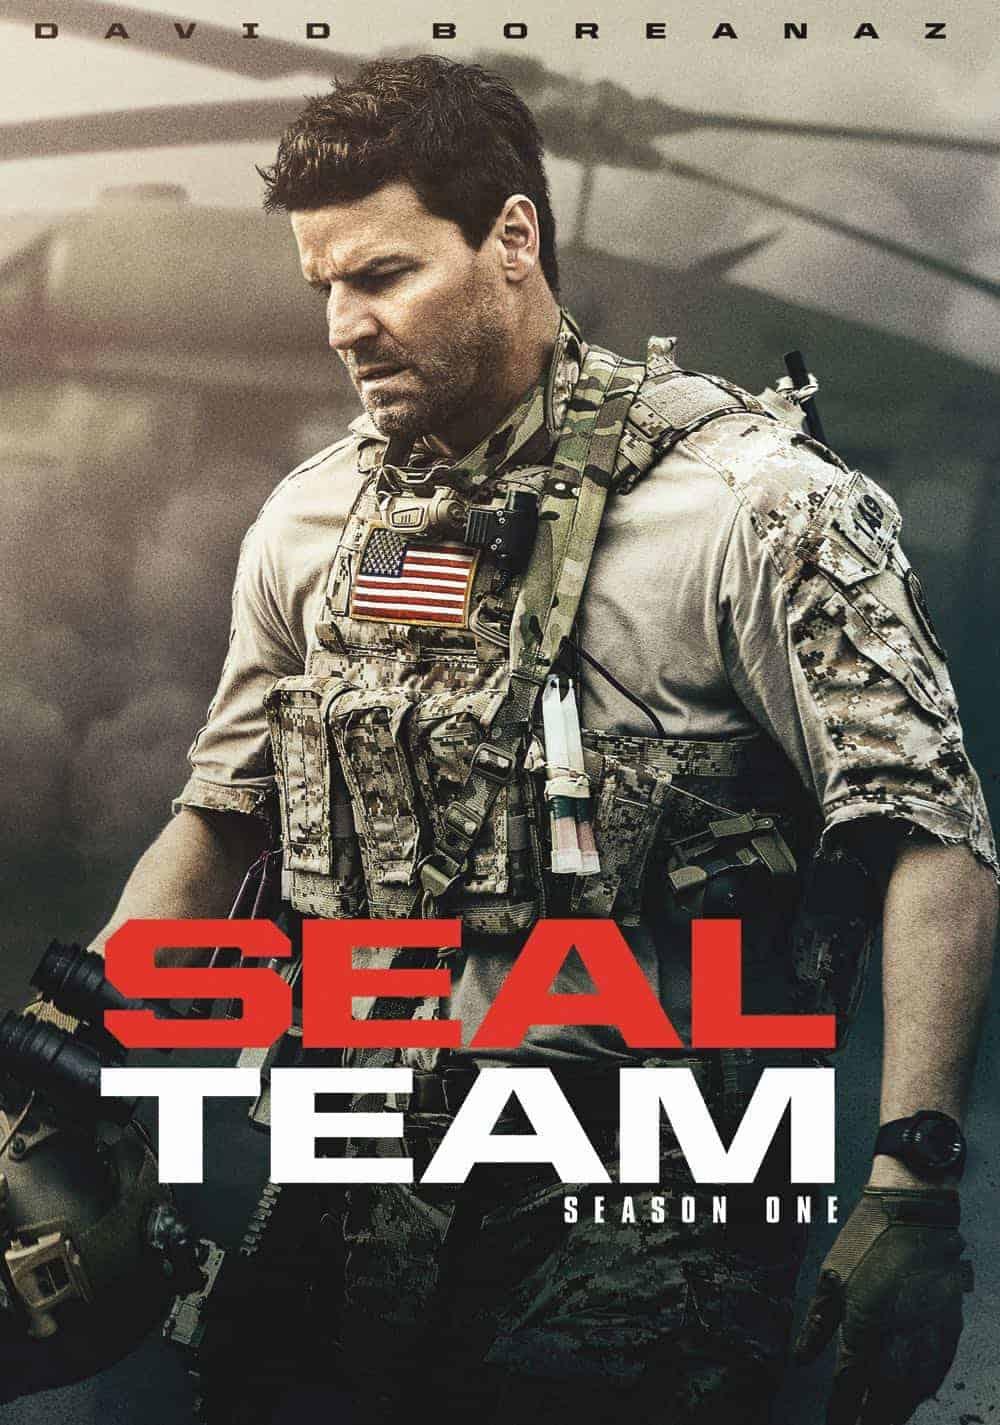 Seal-Team-Season-1-DVD-Cover